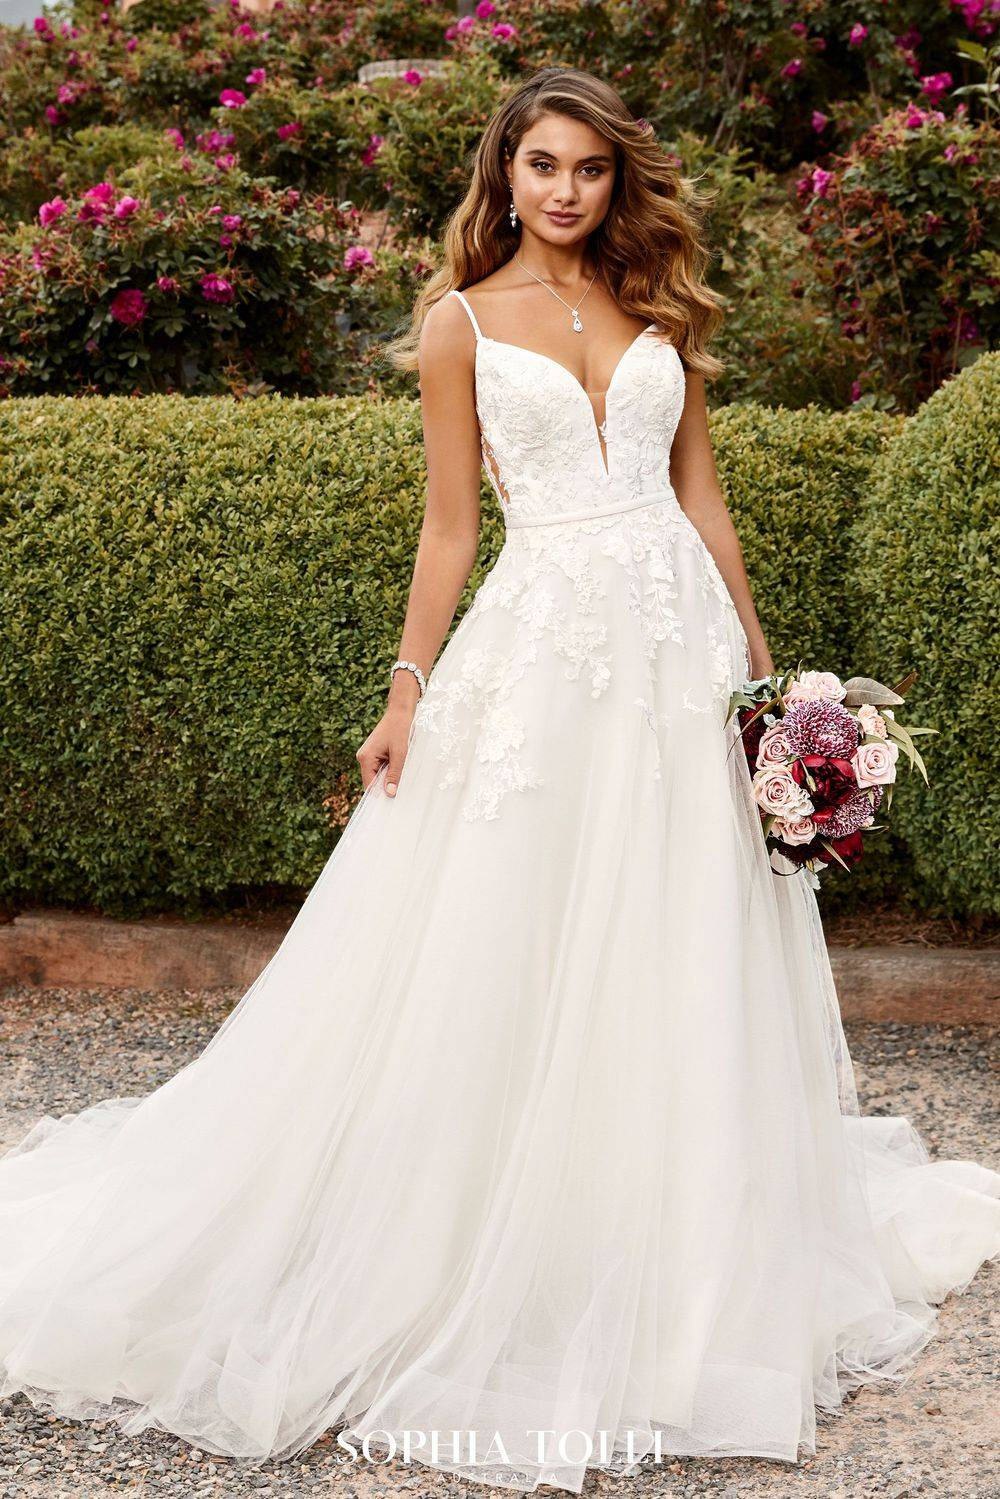 Y22041 Sophia Tolli Kent, Medway, wedding dress, stunning, a line